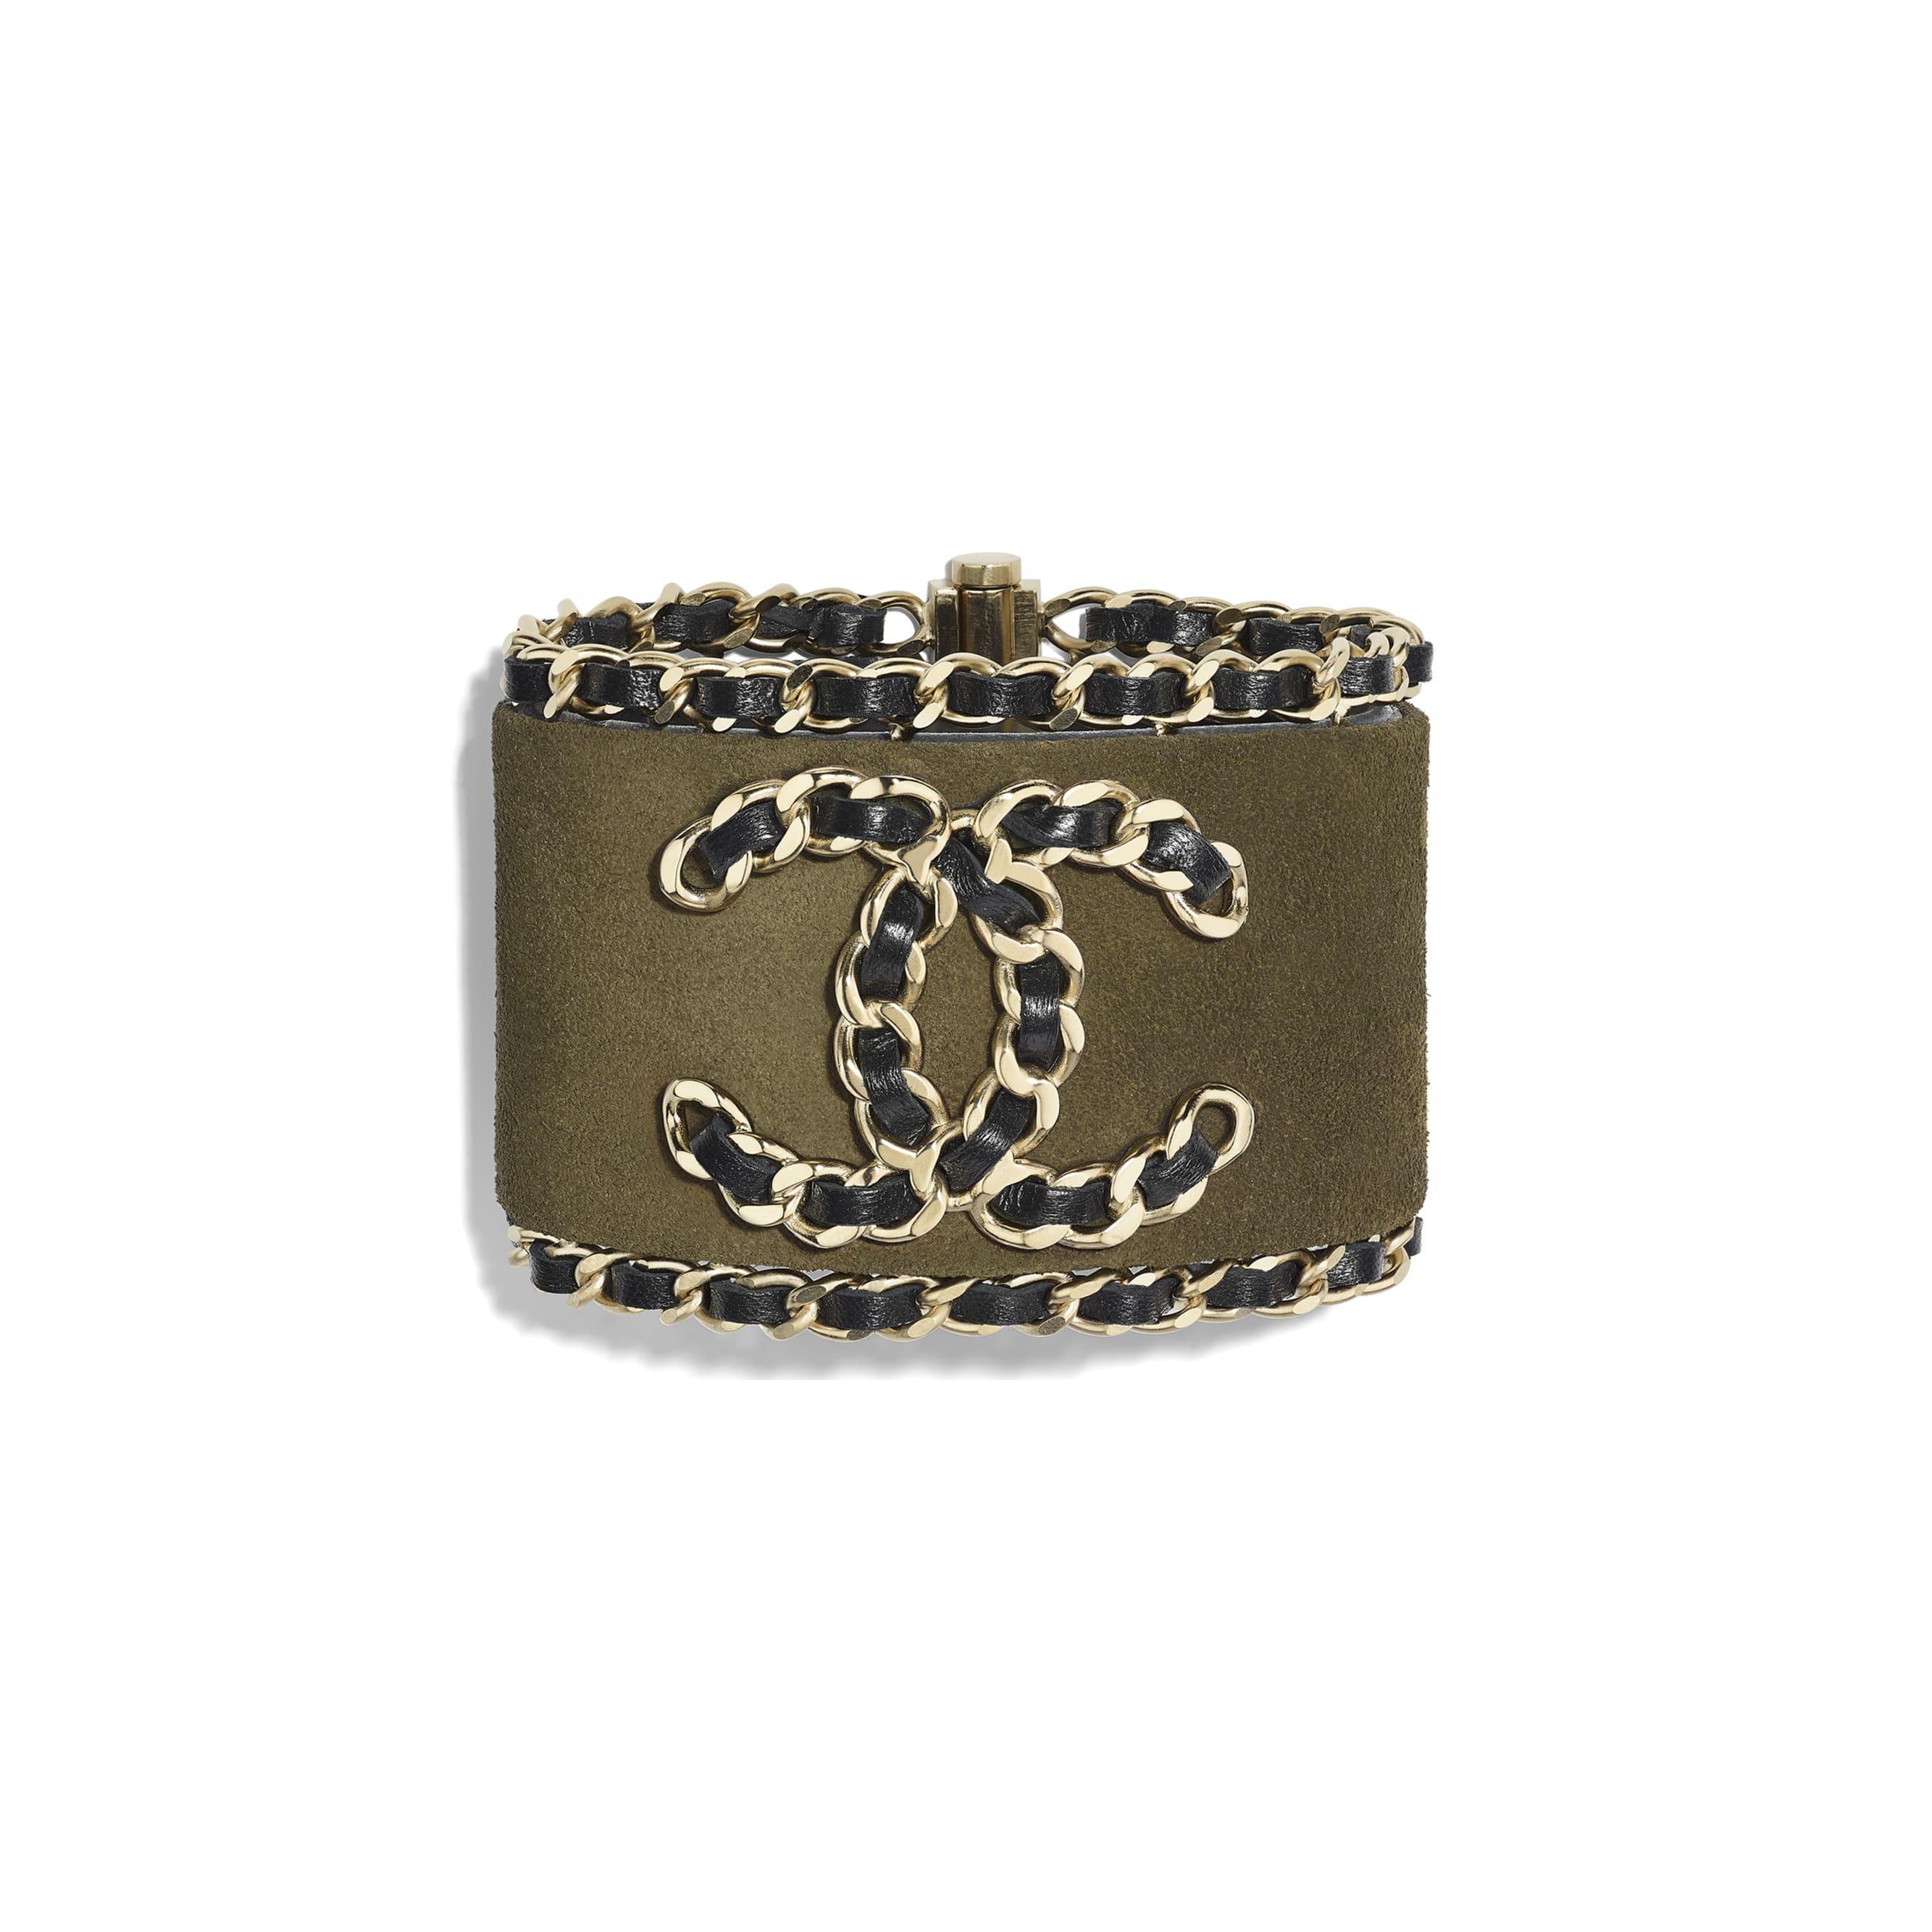 Cuff - Khaki, Black & Gold - Calfskin, Lambskin & Metal - CHANEL - Default view - see standard sized version